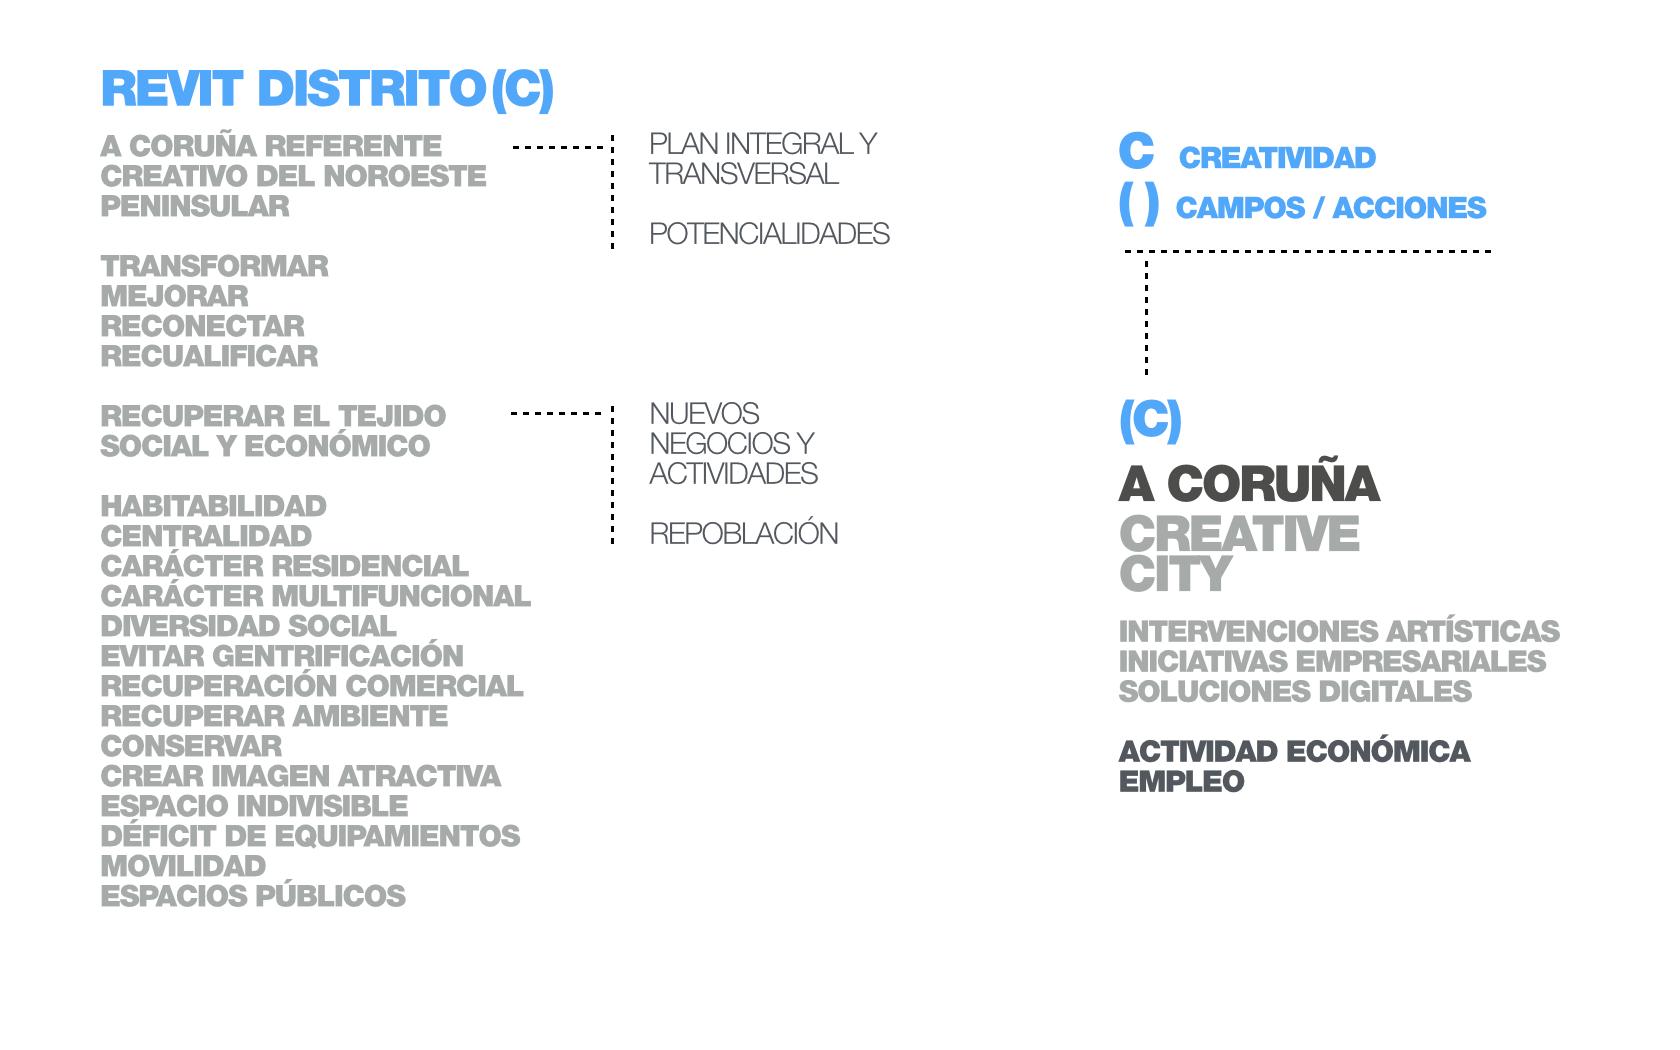 REVIT DISTRITO(C) 10.jpg